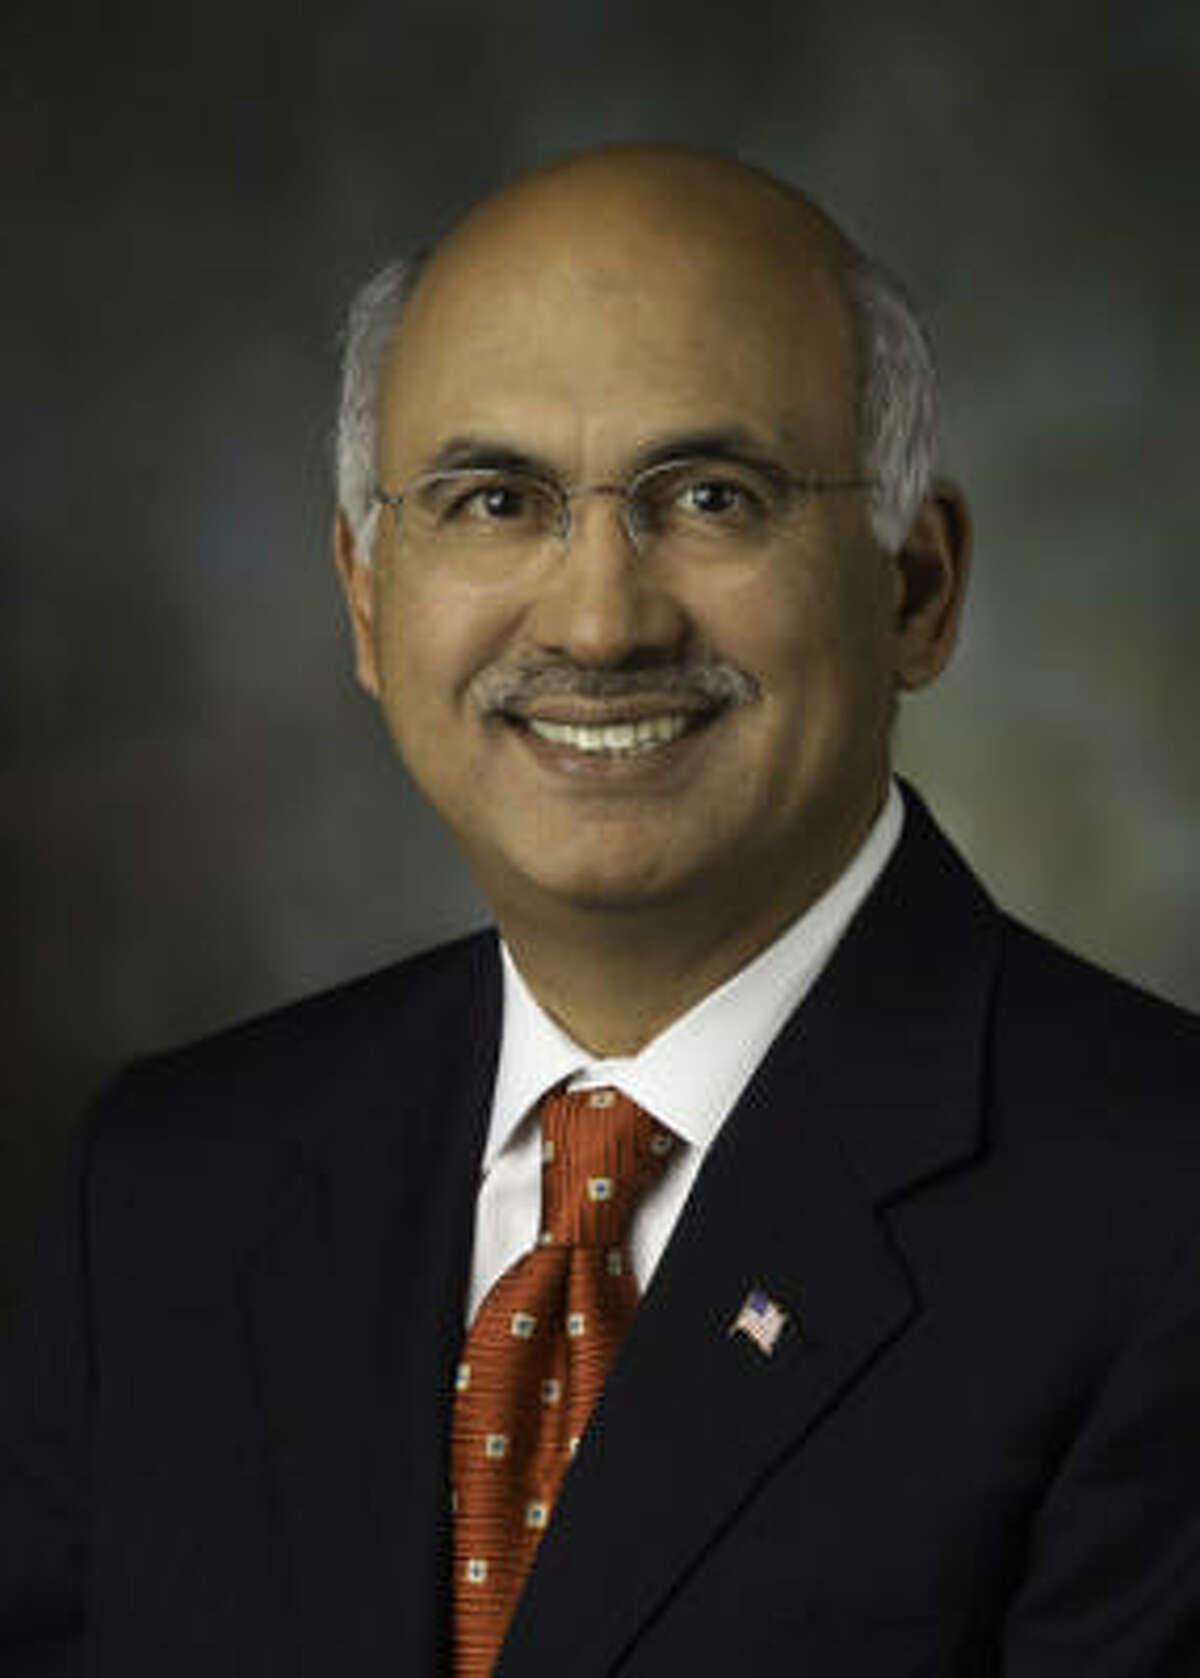 M.J. Khan